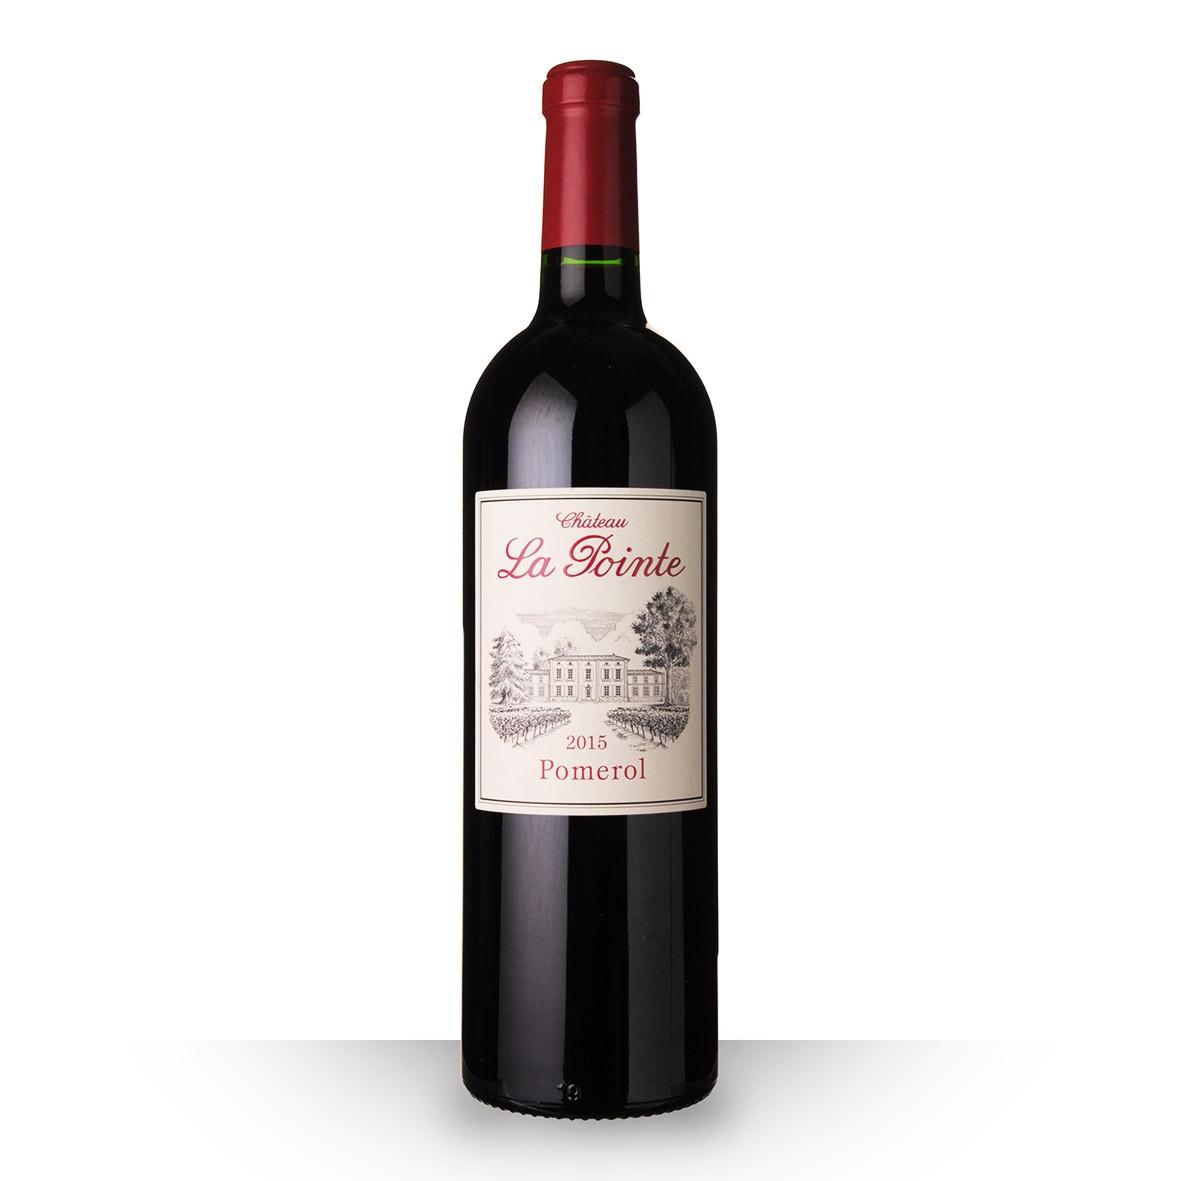 Château la Pointe Pomerol Rouge 2015 75cl www.odyssee-vins.com